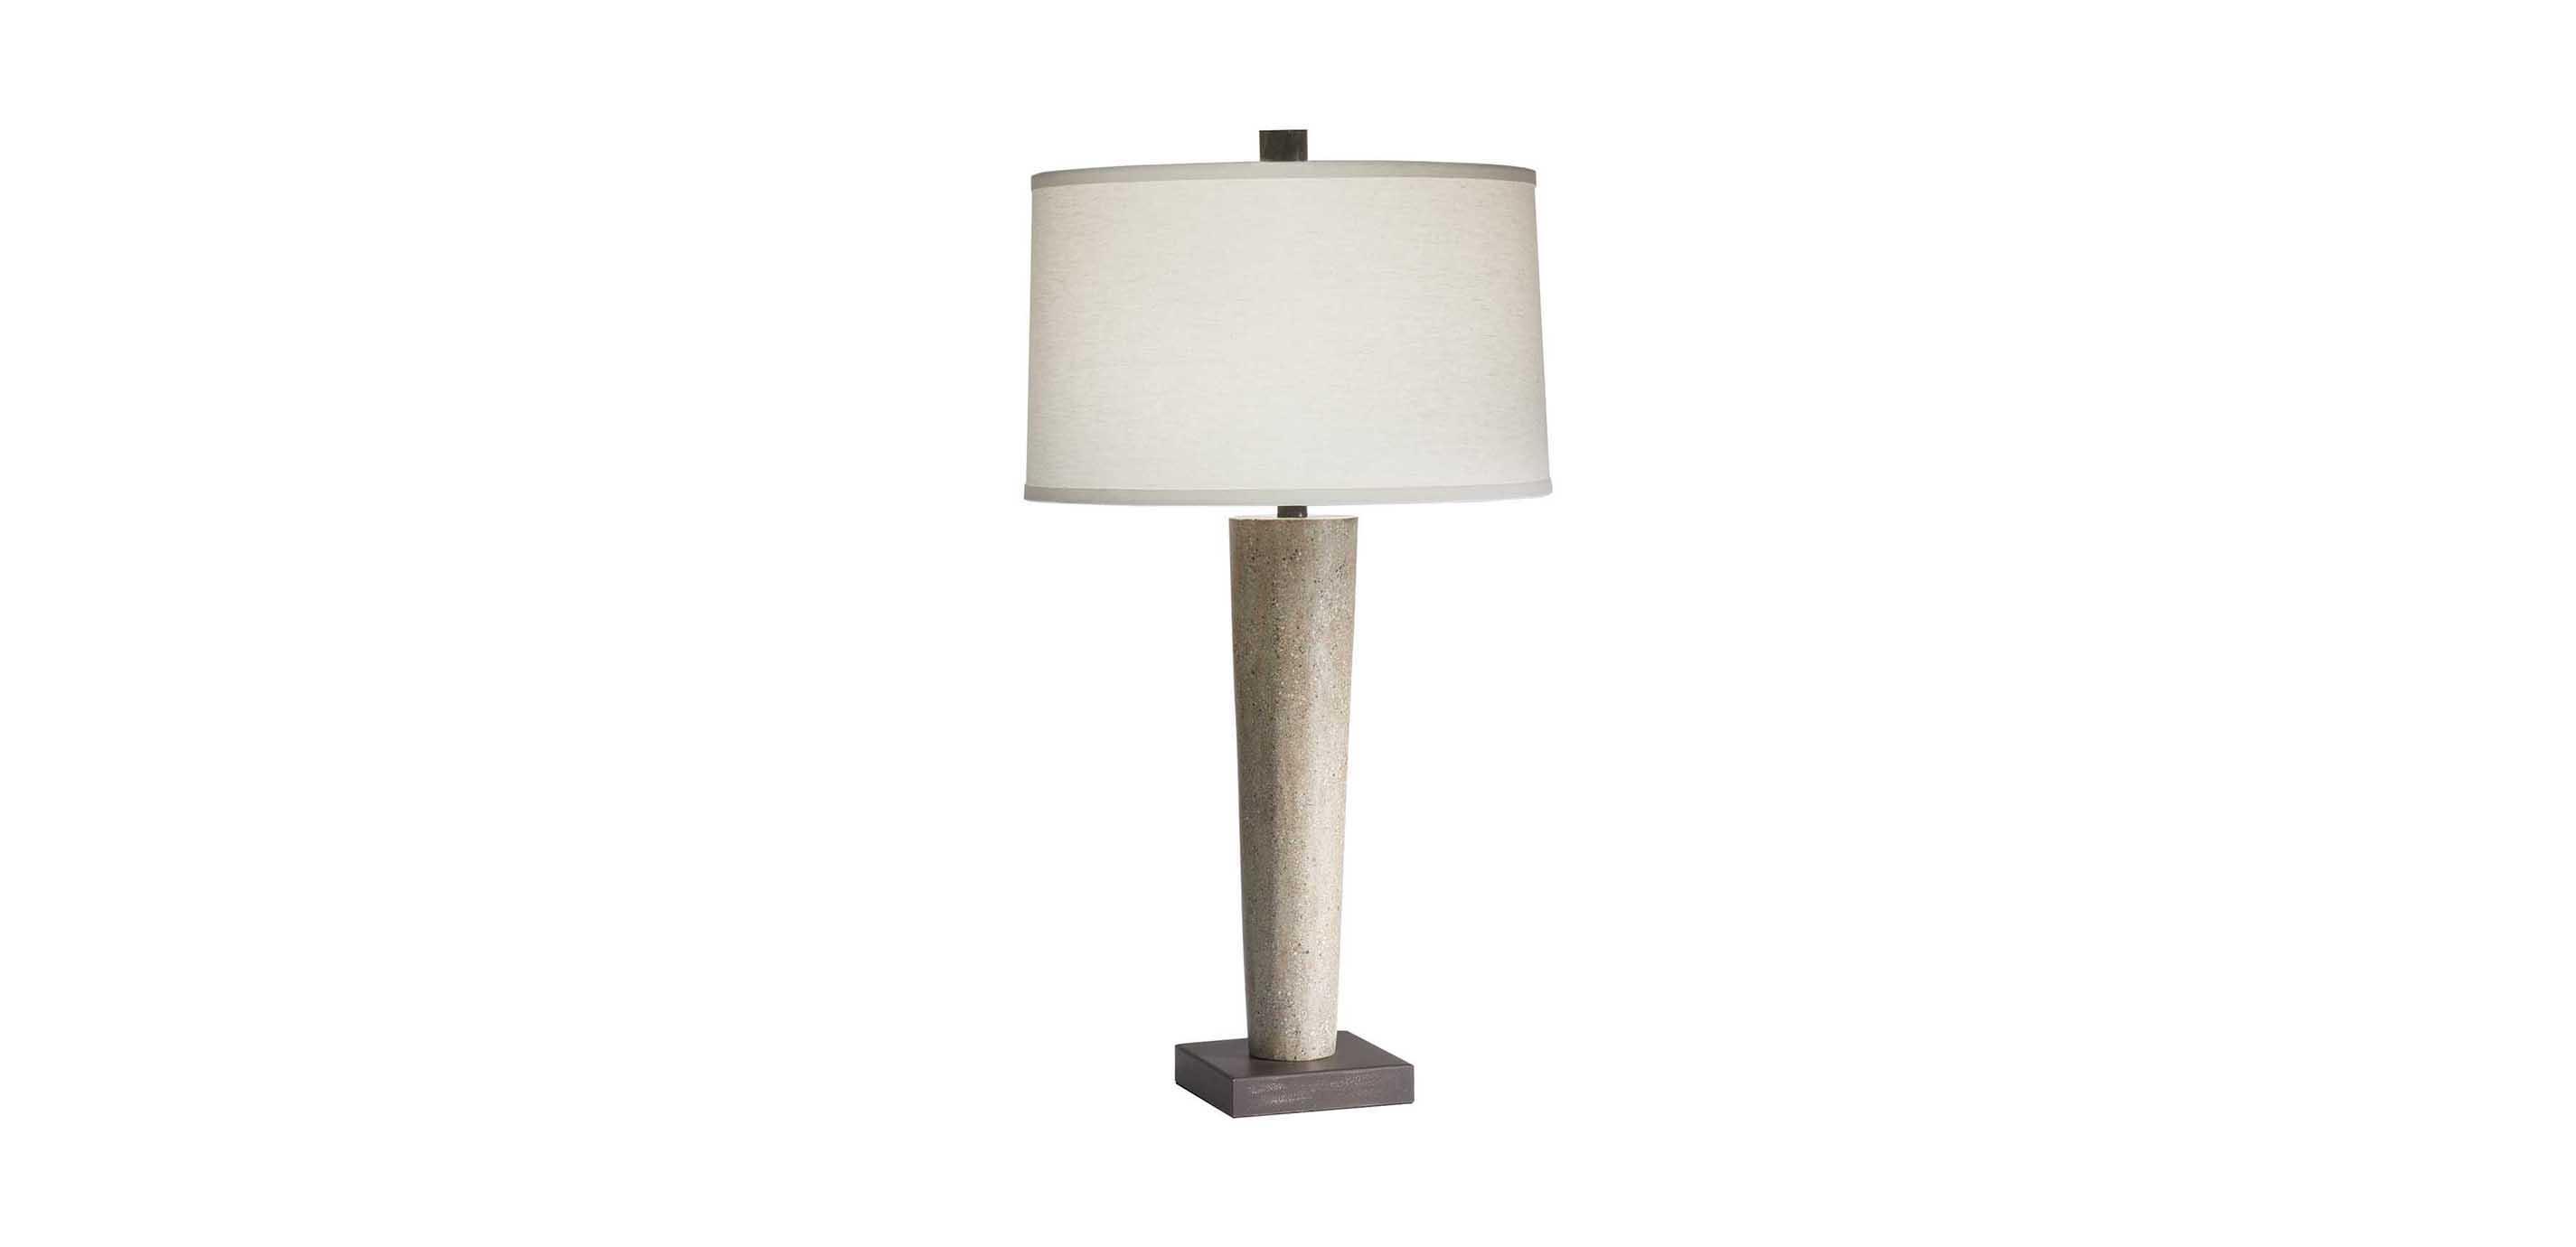 concrete table lamp. Images Null Concrete Table Lamp